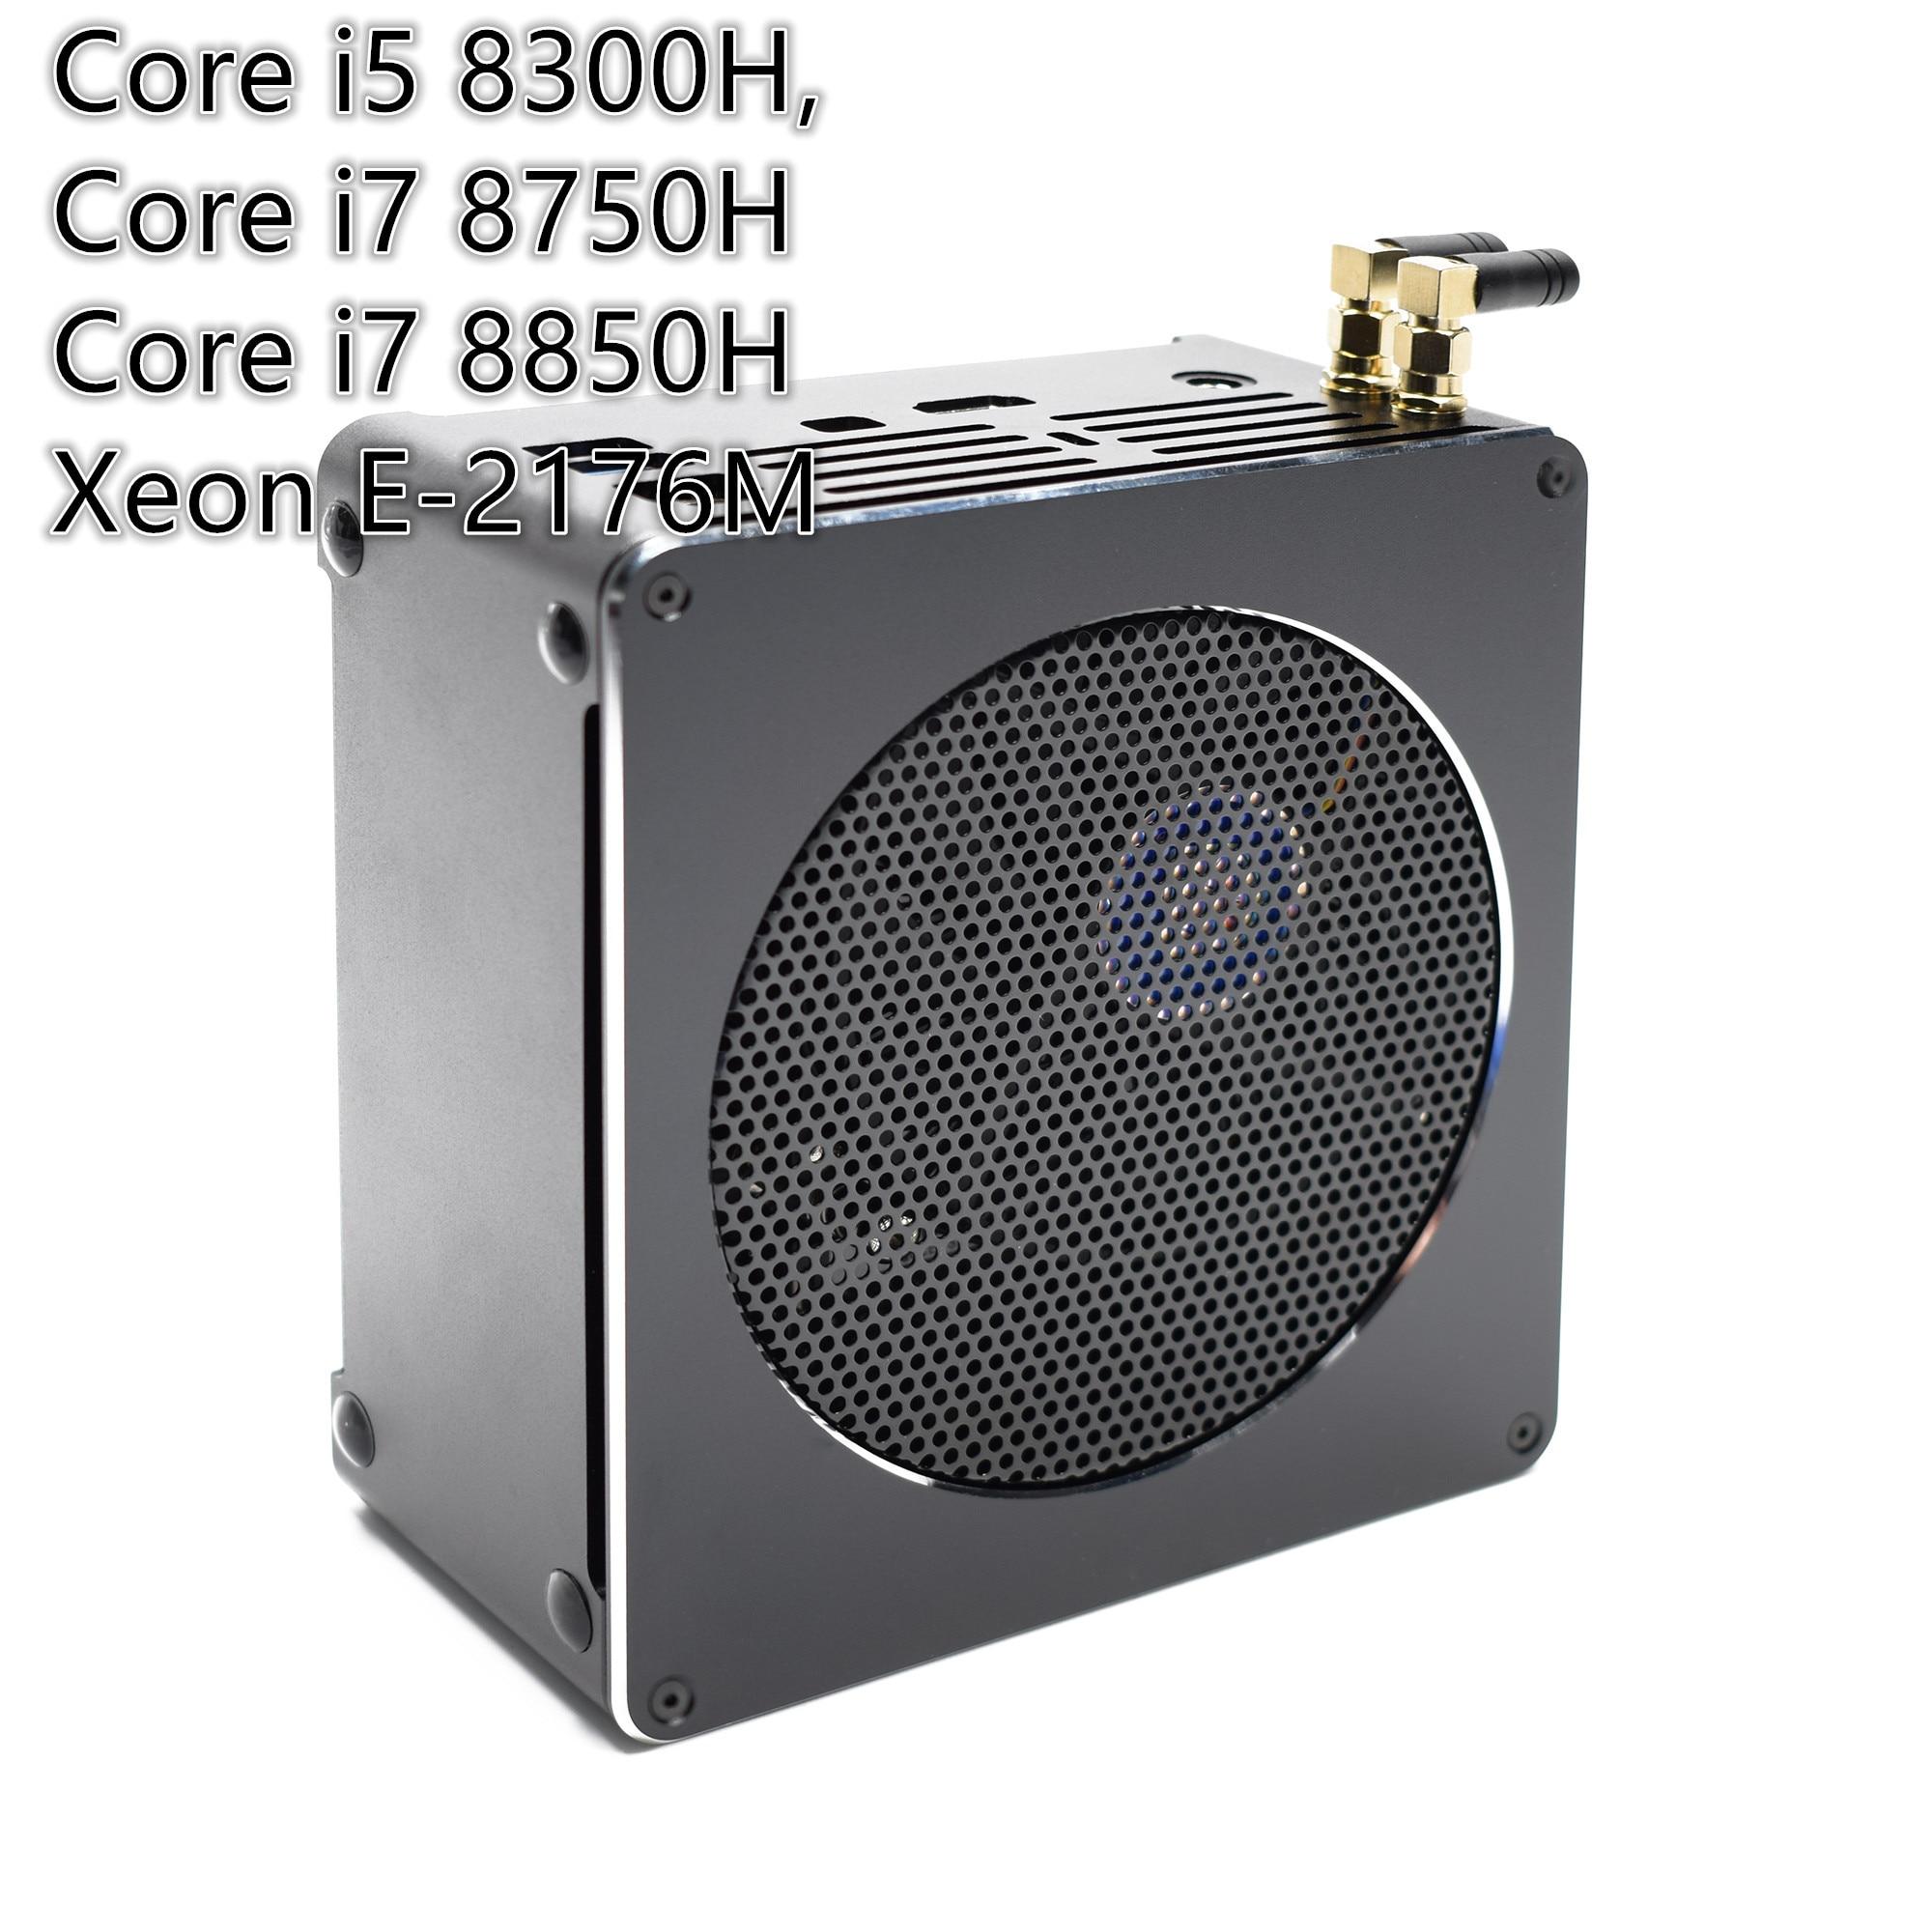 "Gaming Mini PC Mini-Computer Intel i7 8850H i5 8300H Windows 10 2 * DDR4 2 * M.2 SSD + 1*2.5 ""SATA Nuc Nettop 4K UHD HDMI DP WiFi"